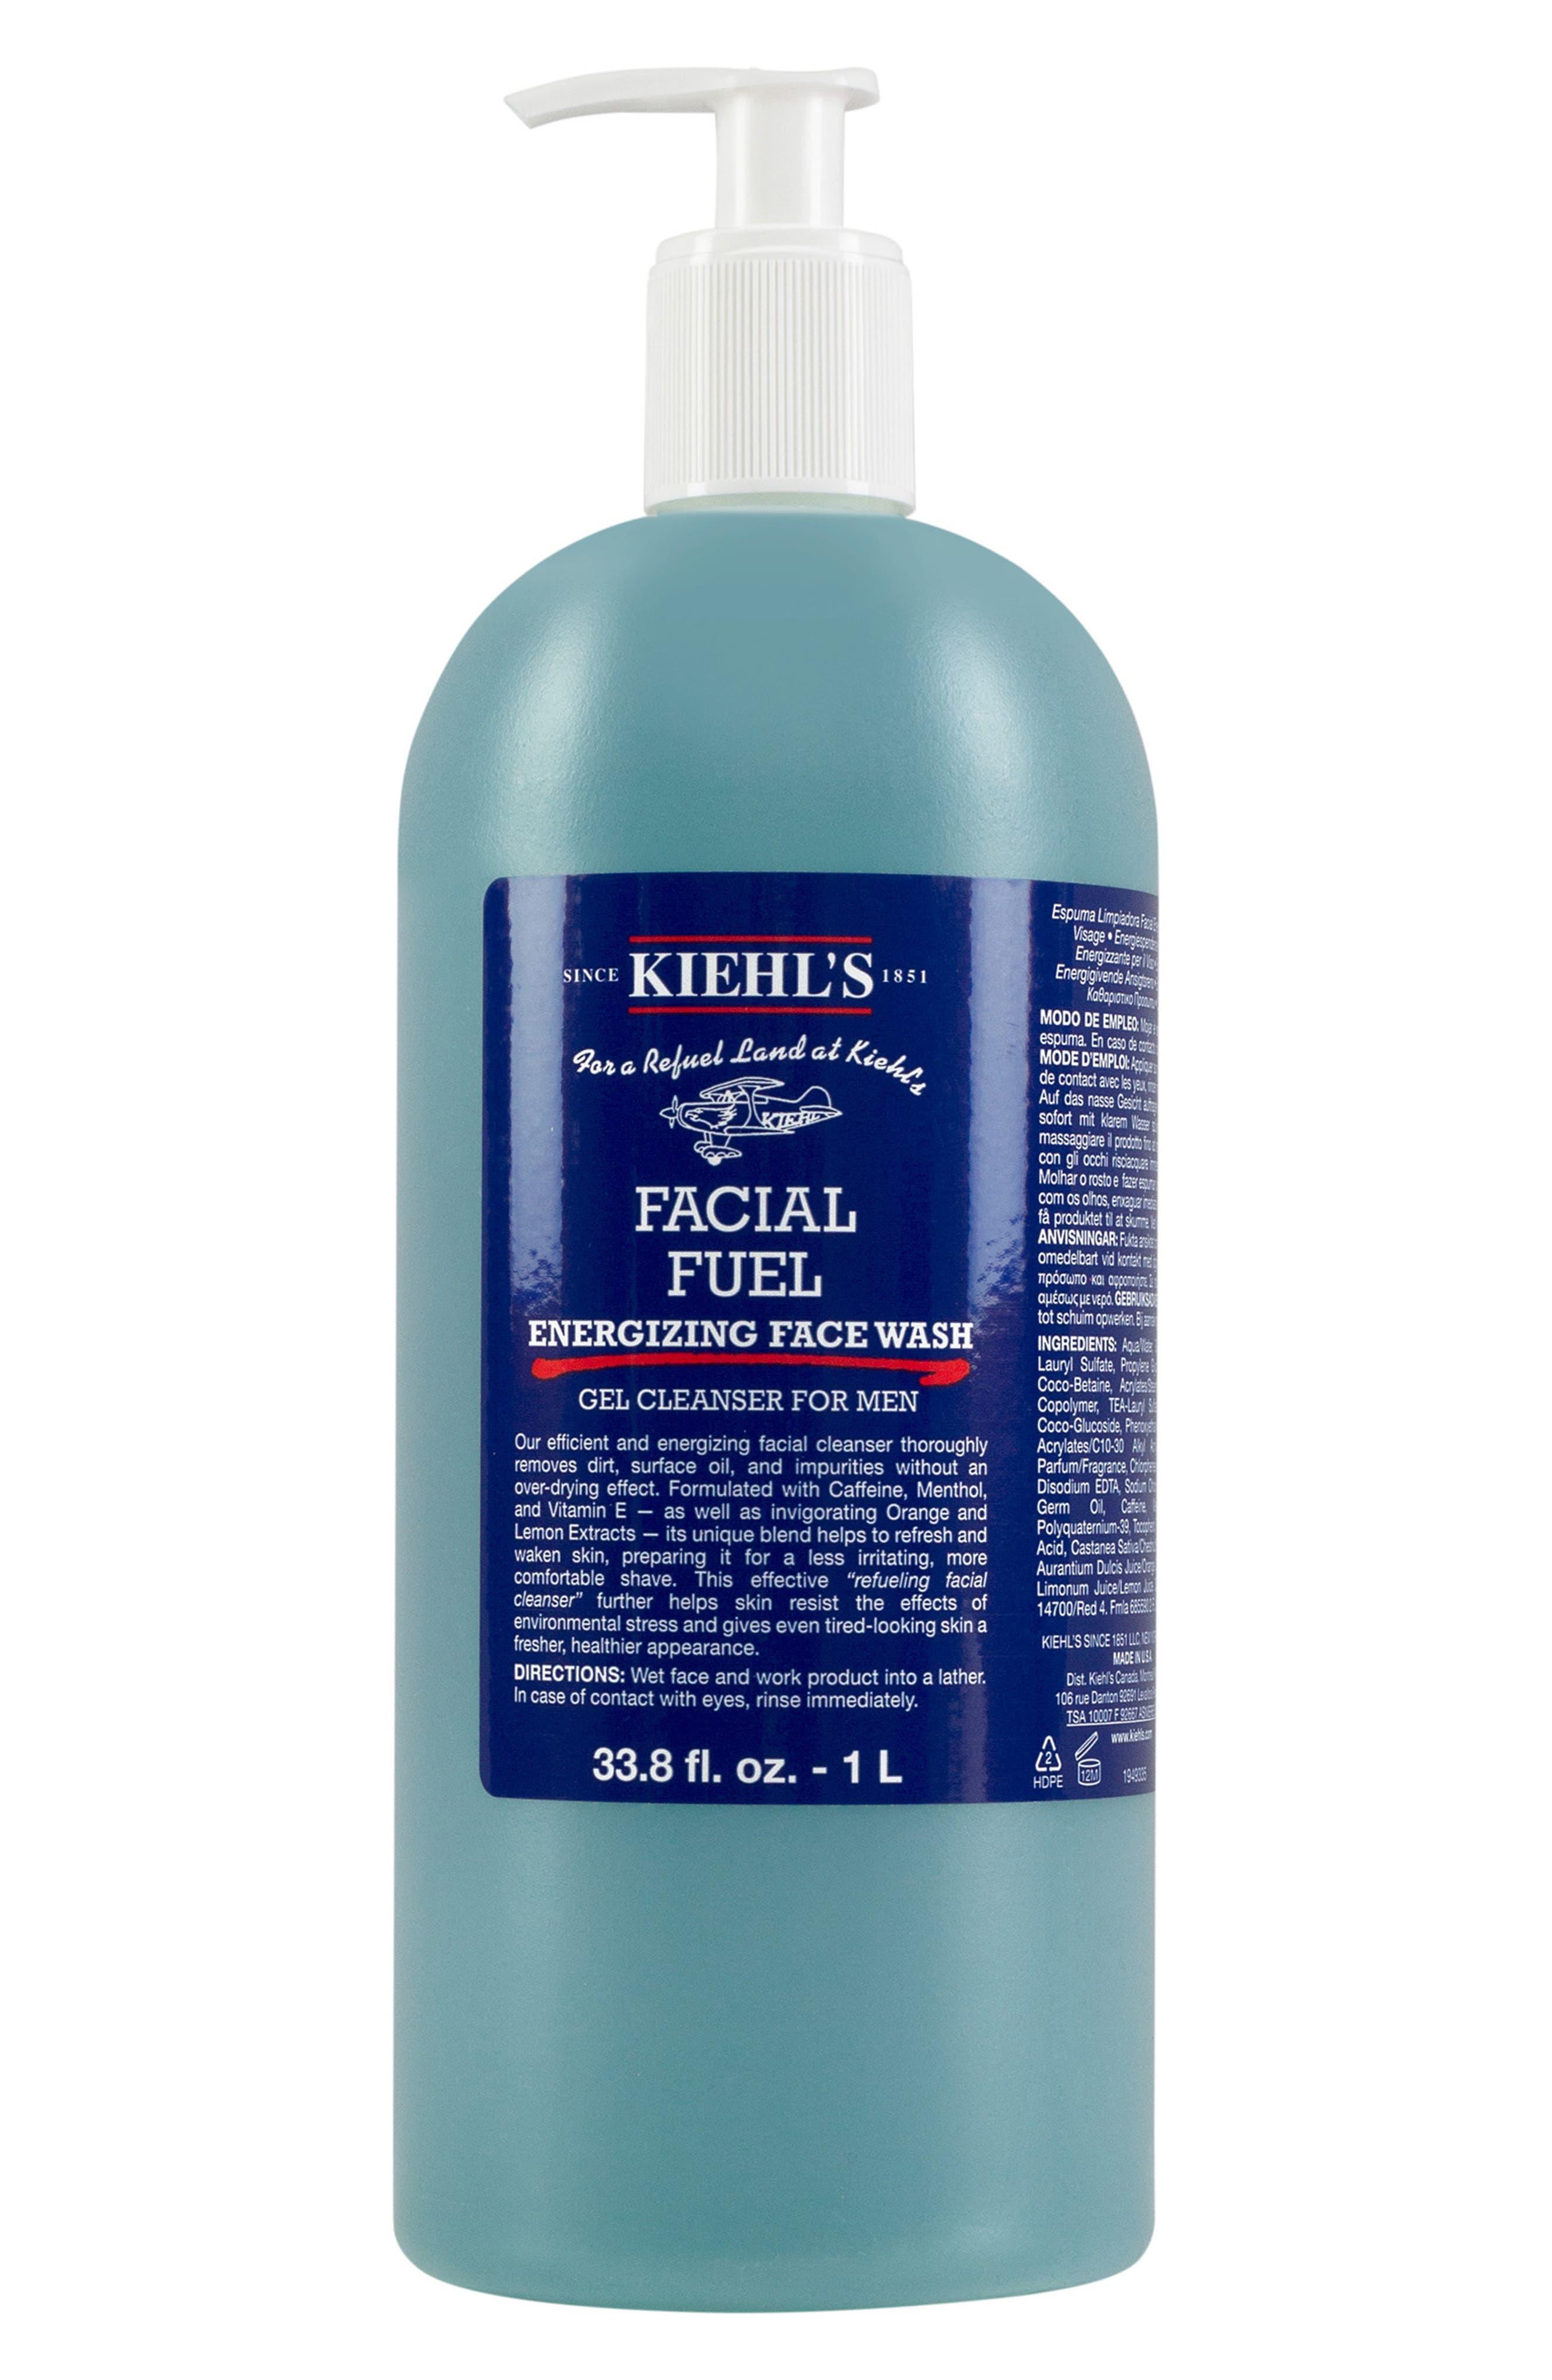 KIEHL'S SINCE 1851 Jumbo Facial Fuel Energizing Face Wash, Main, color, NO COLOR